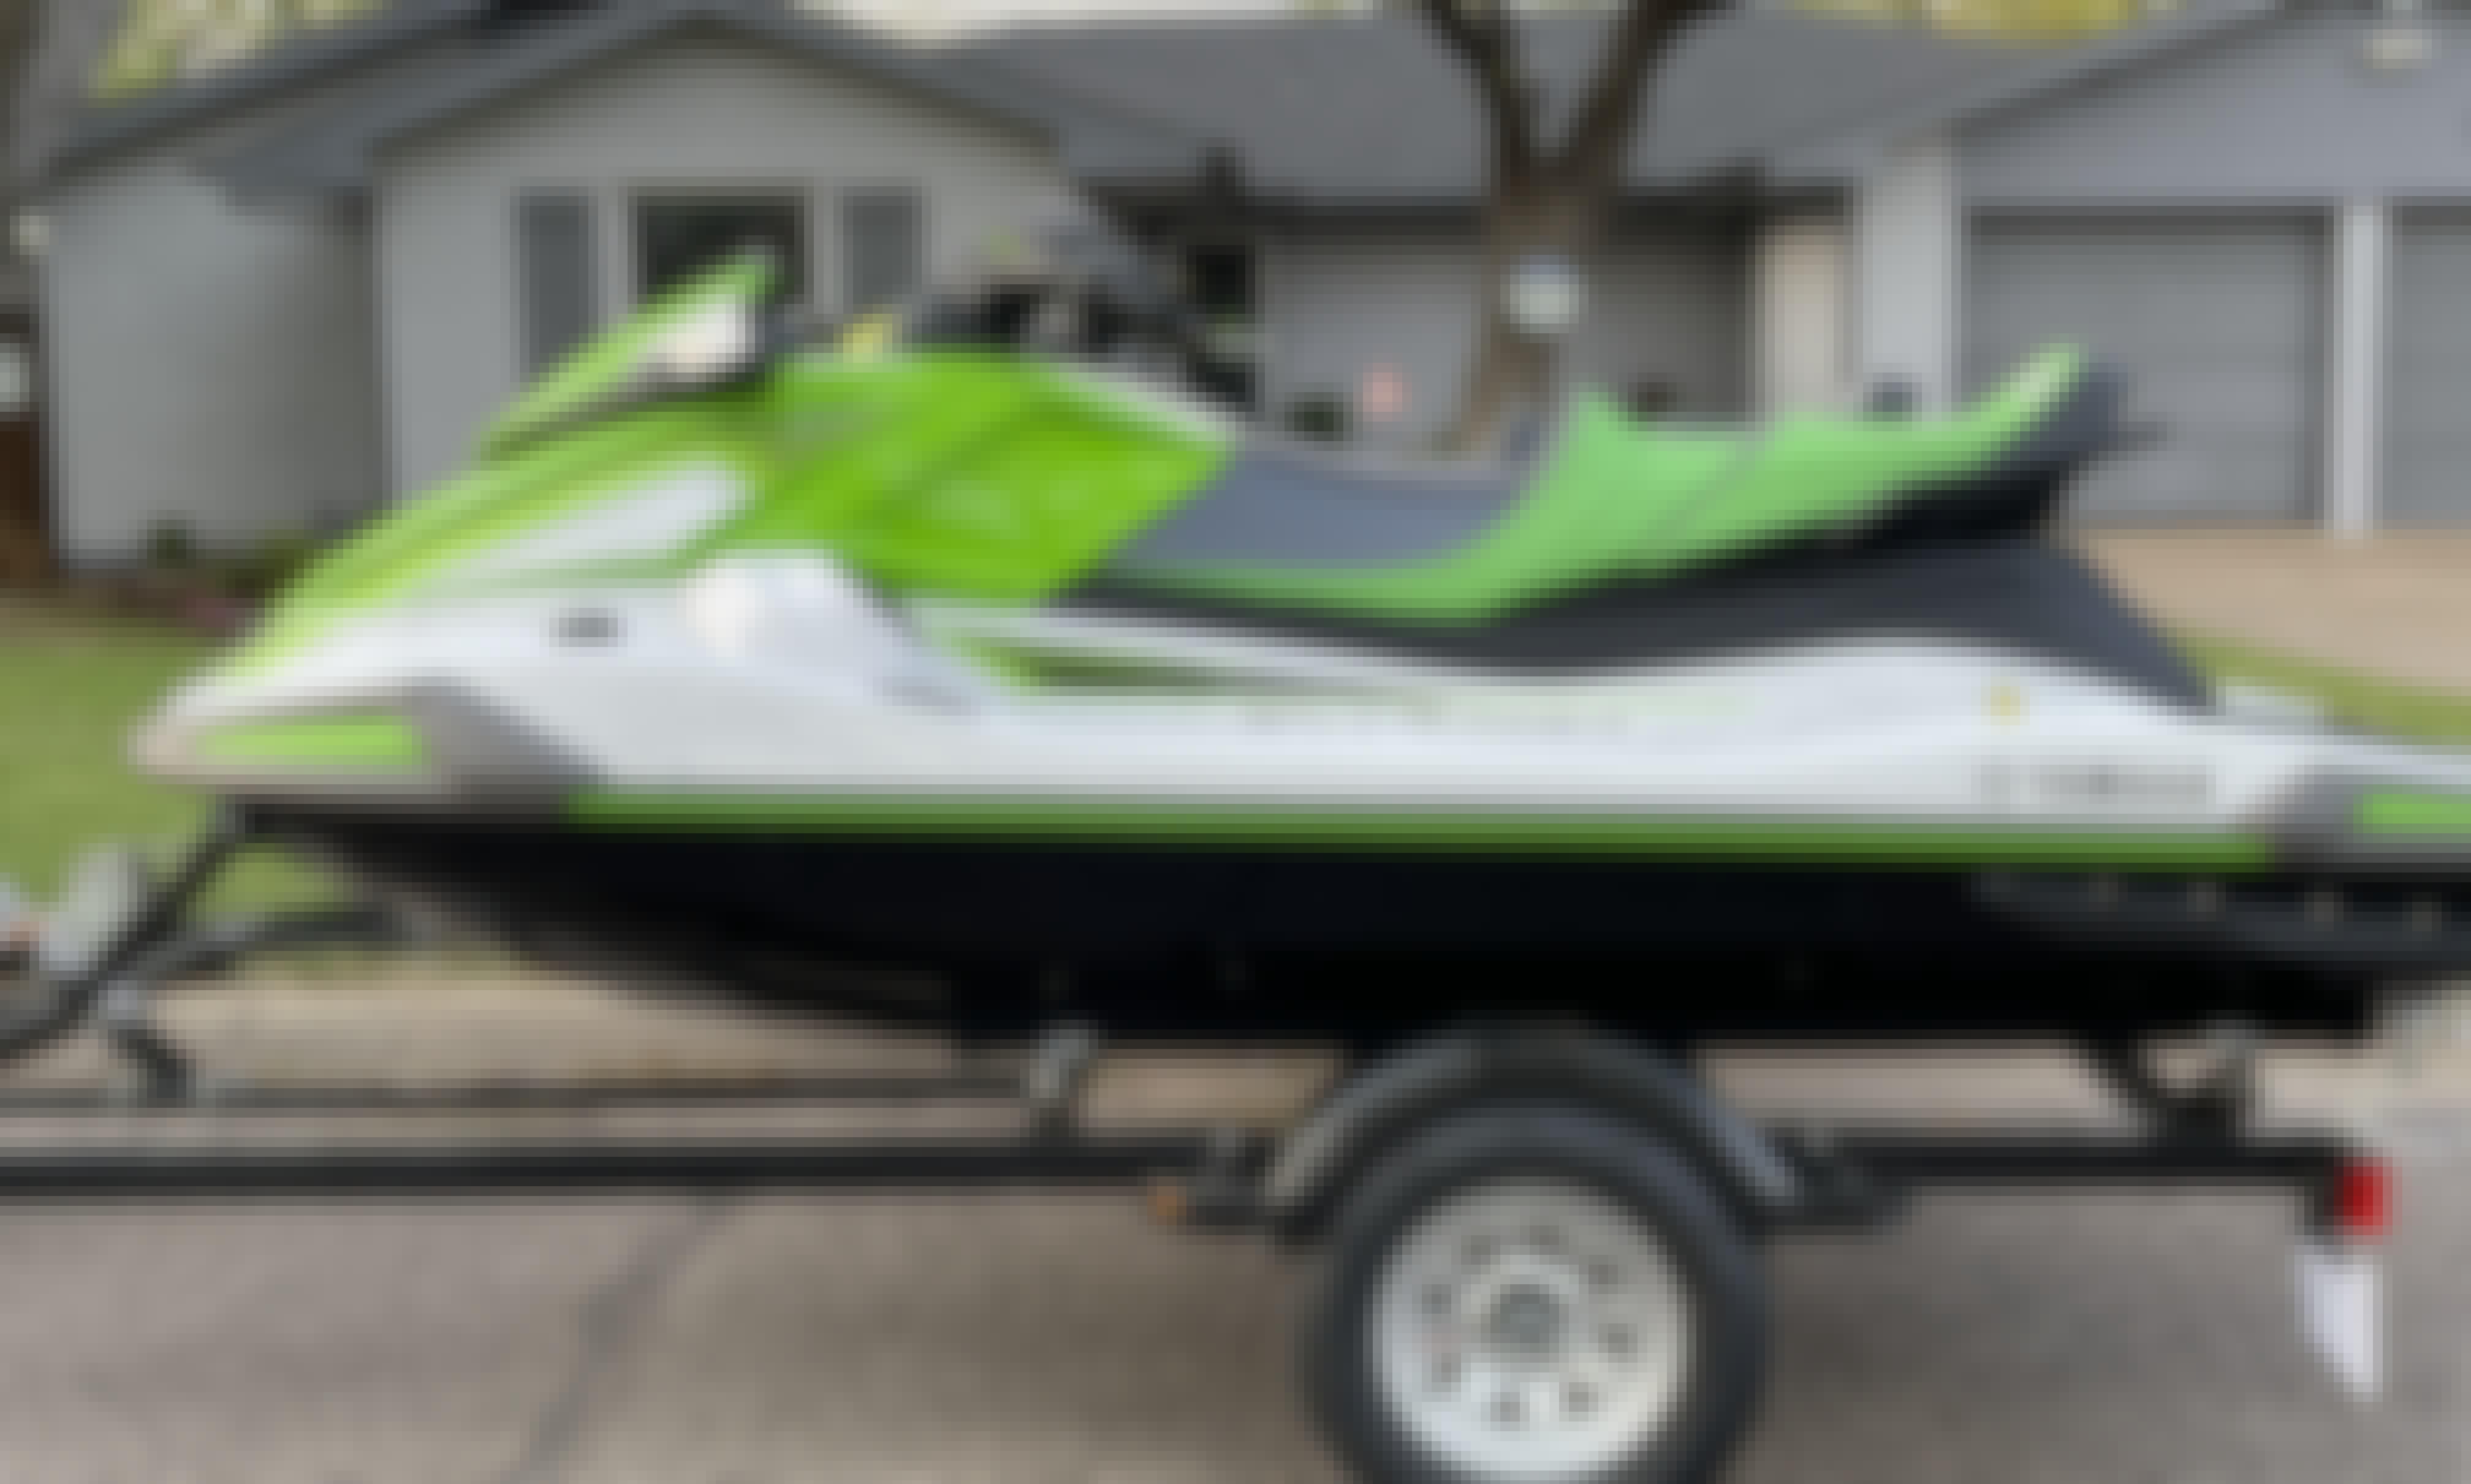 2021 Yamaha Waverunner Jet Skis For Rent x 2 | Lake Granbury